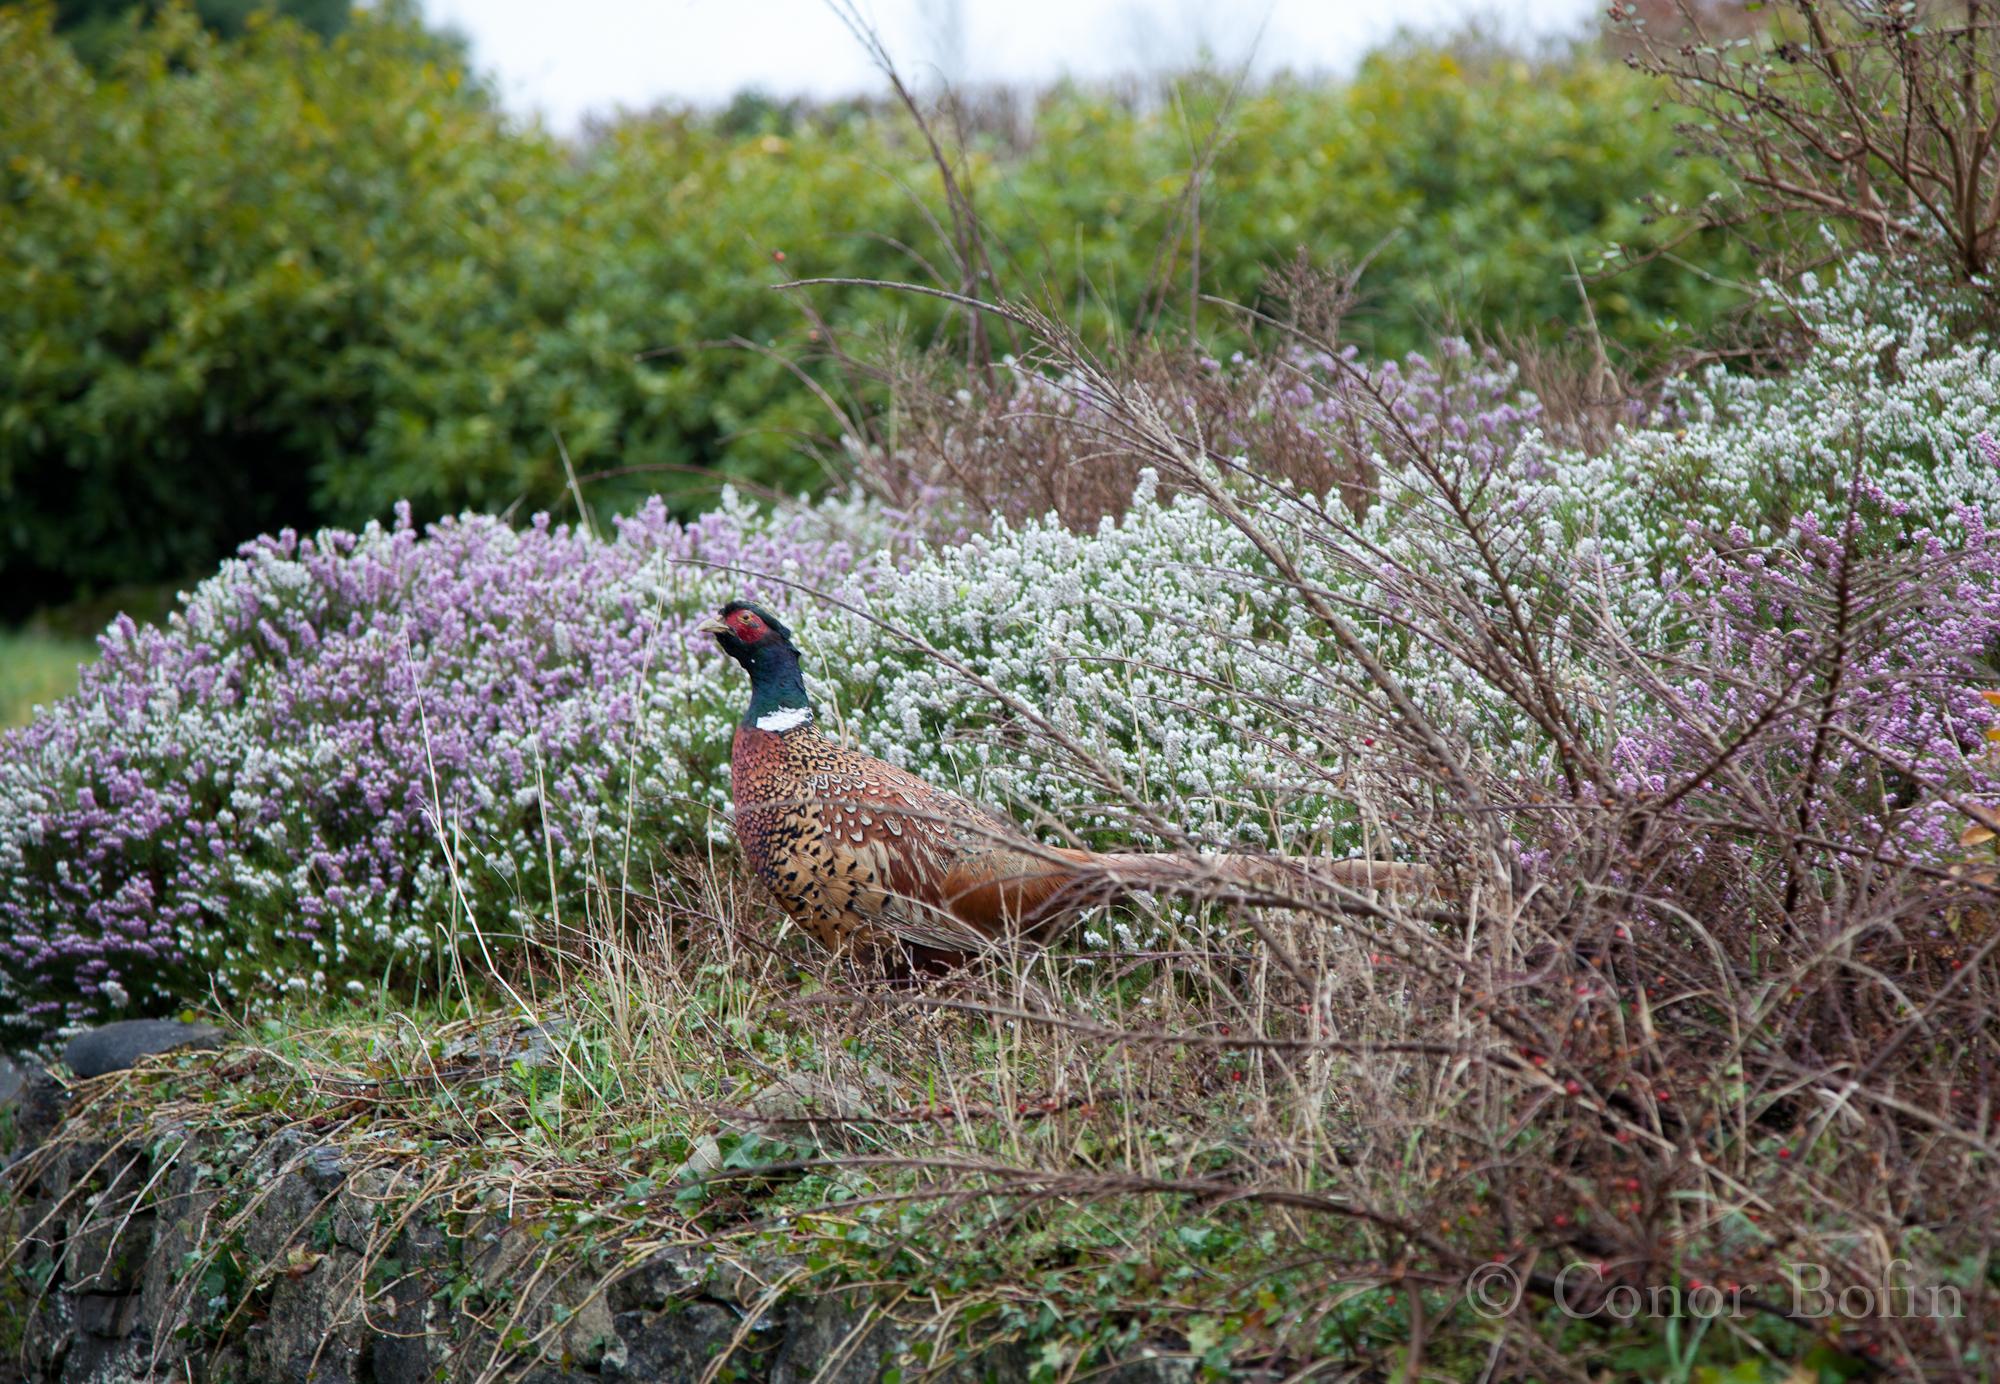 Wild Pheasants Ireland Pheasant-in-the-wild.jpg